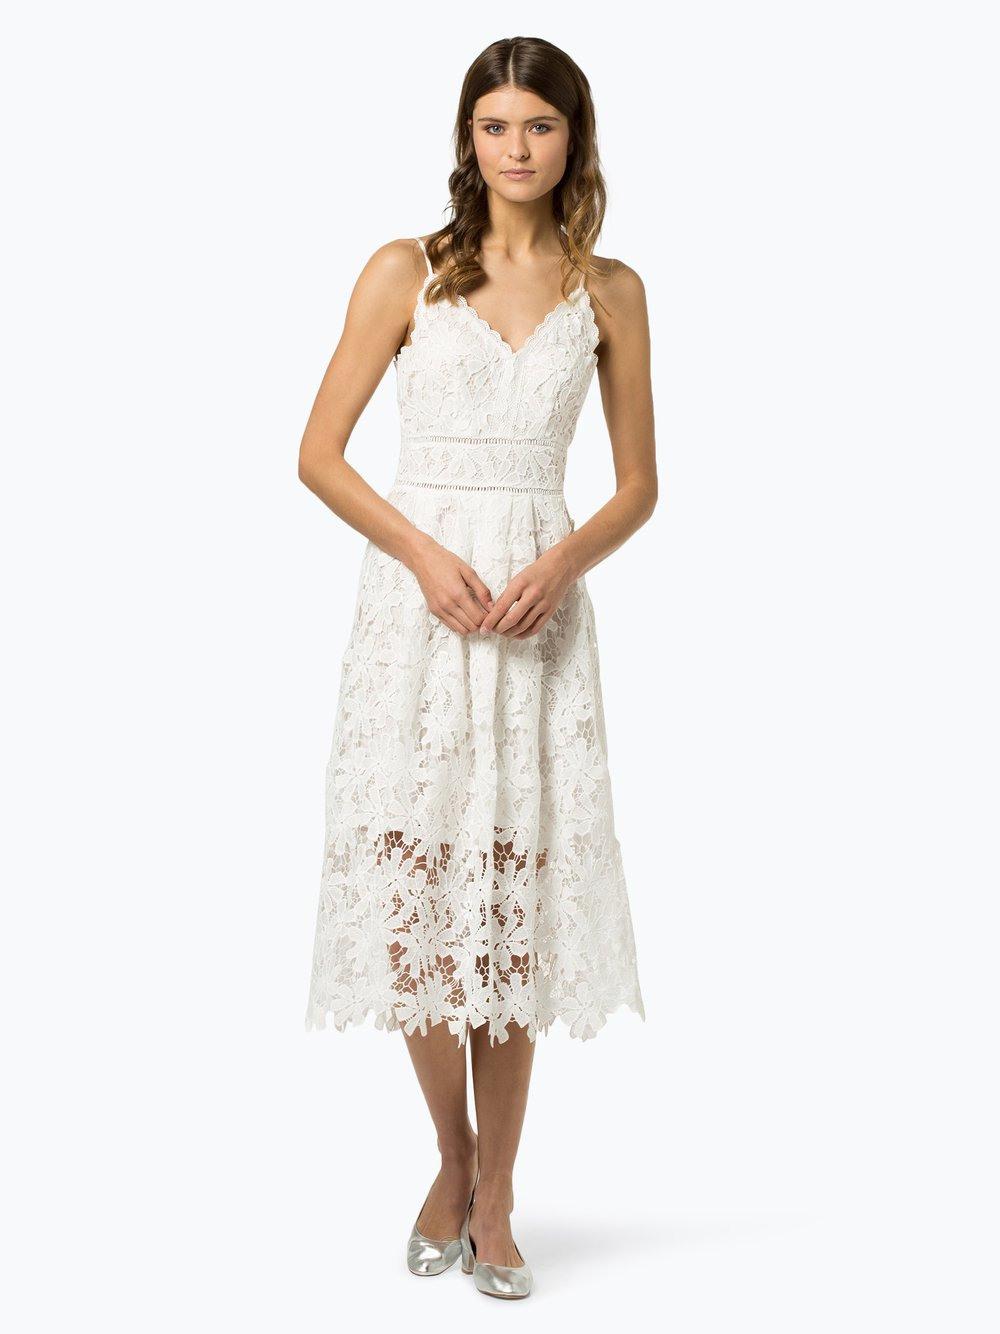 Genial Y.A.S Abendkleid Spezialgebiet17 Luxus Y.A.S Abendkleid Boutique